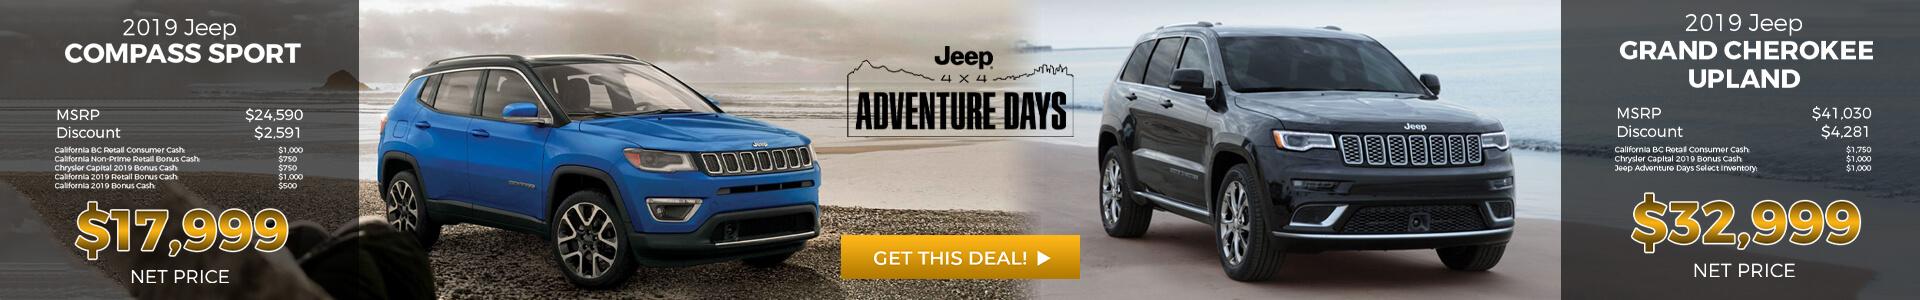 Jeep Grand Cherokee/Jeep Compass